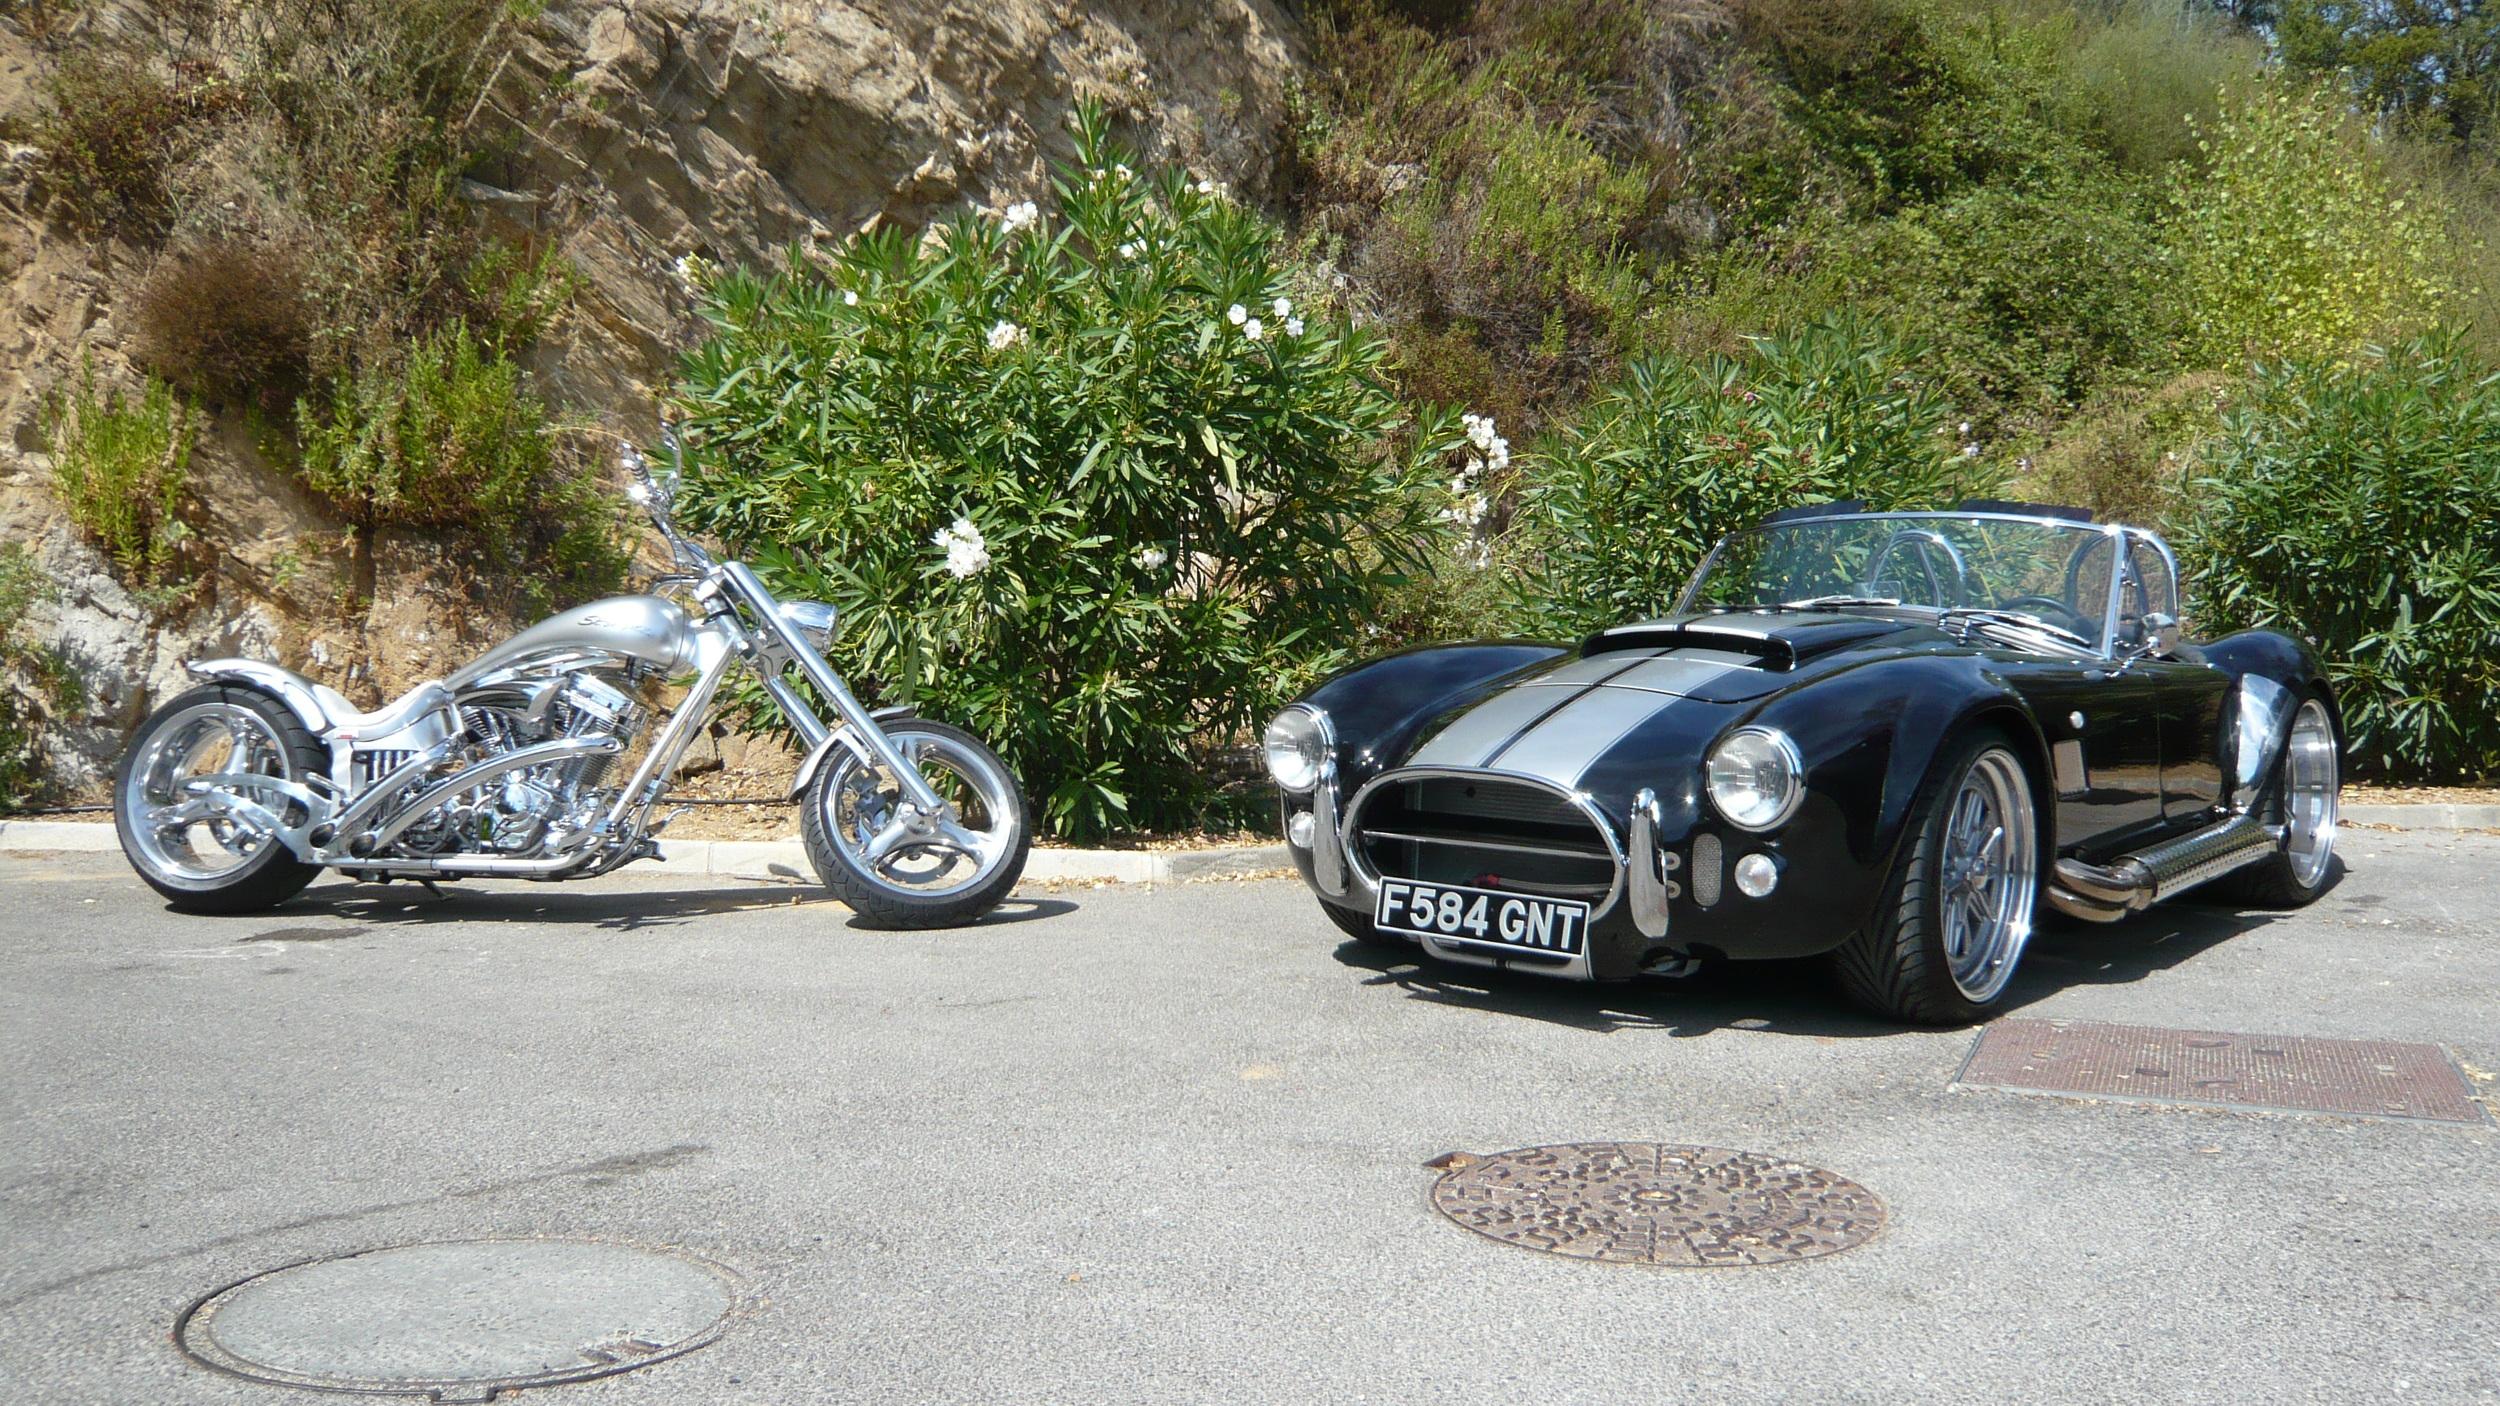 AC Cobra and Custom Bike